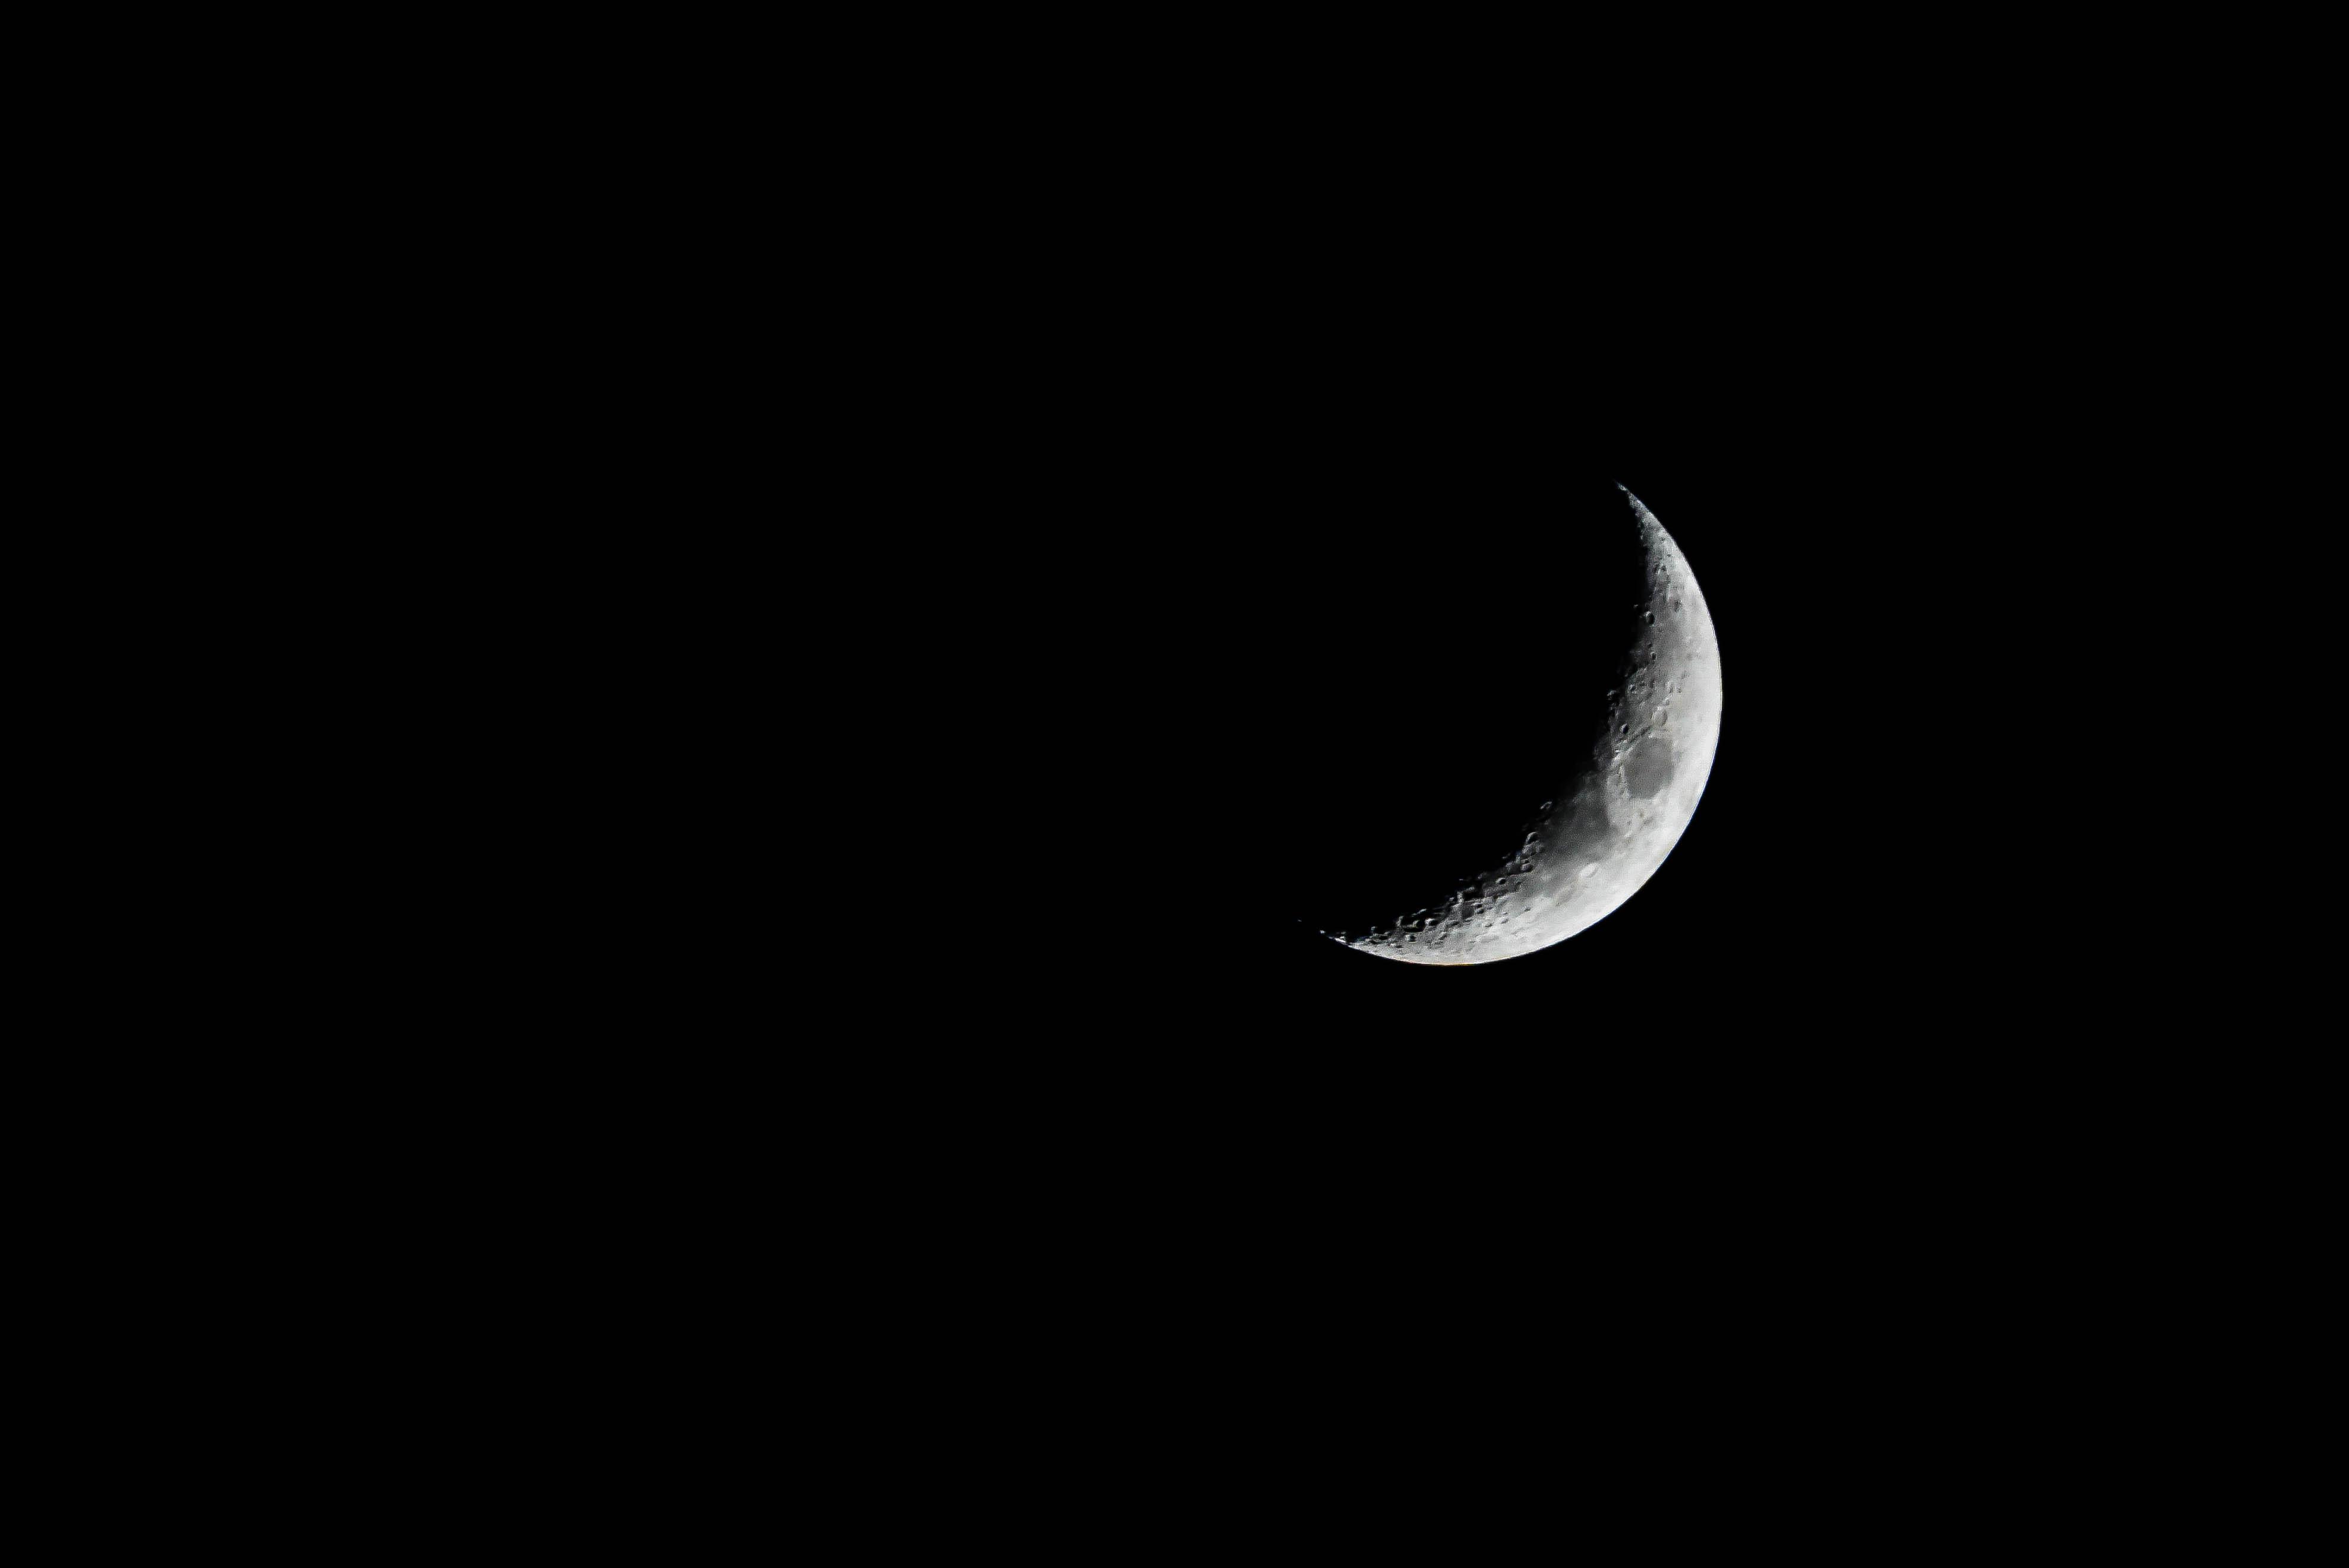 Free Images : black and white, night, dark, symbol